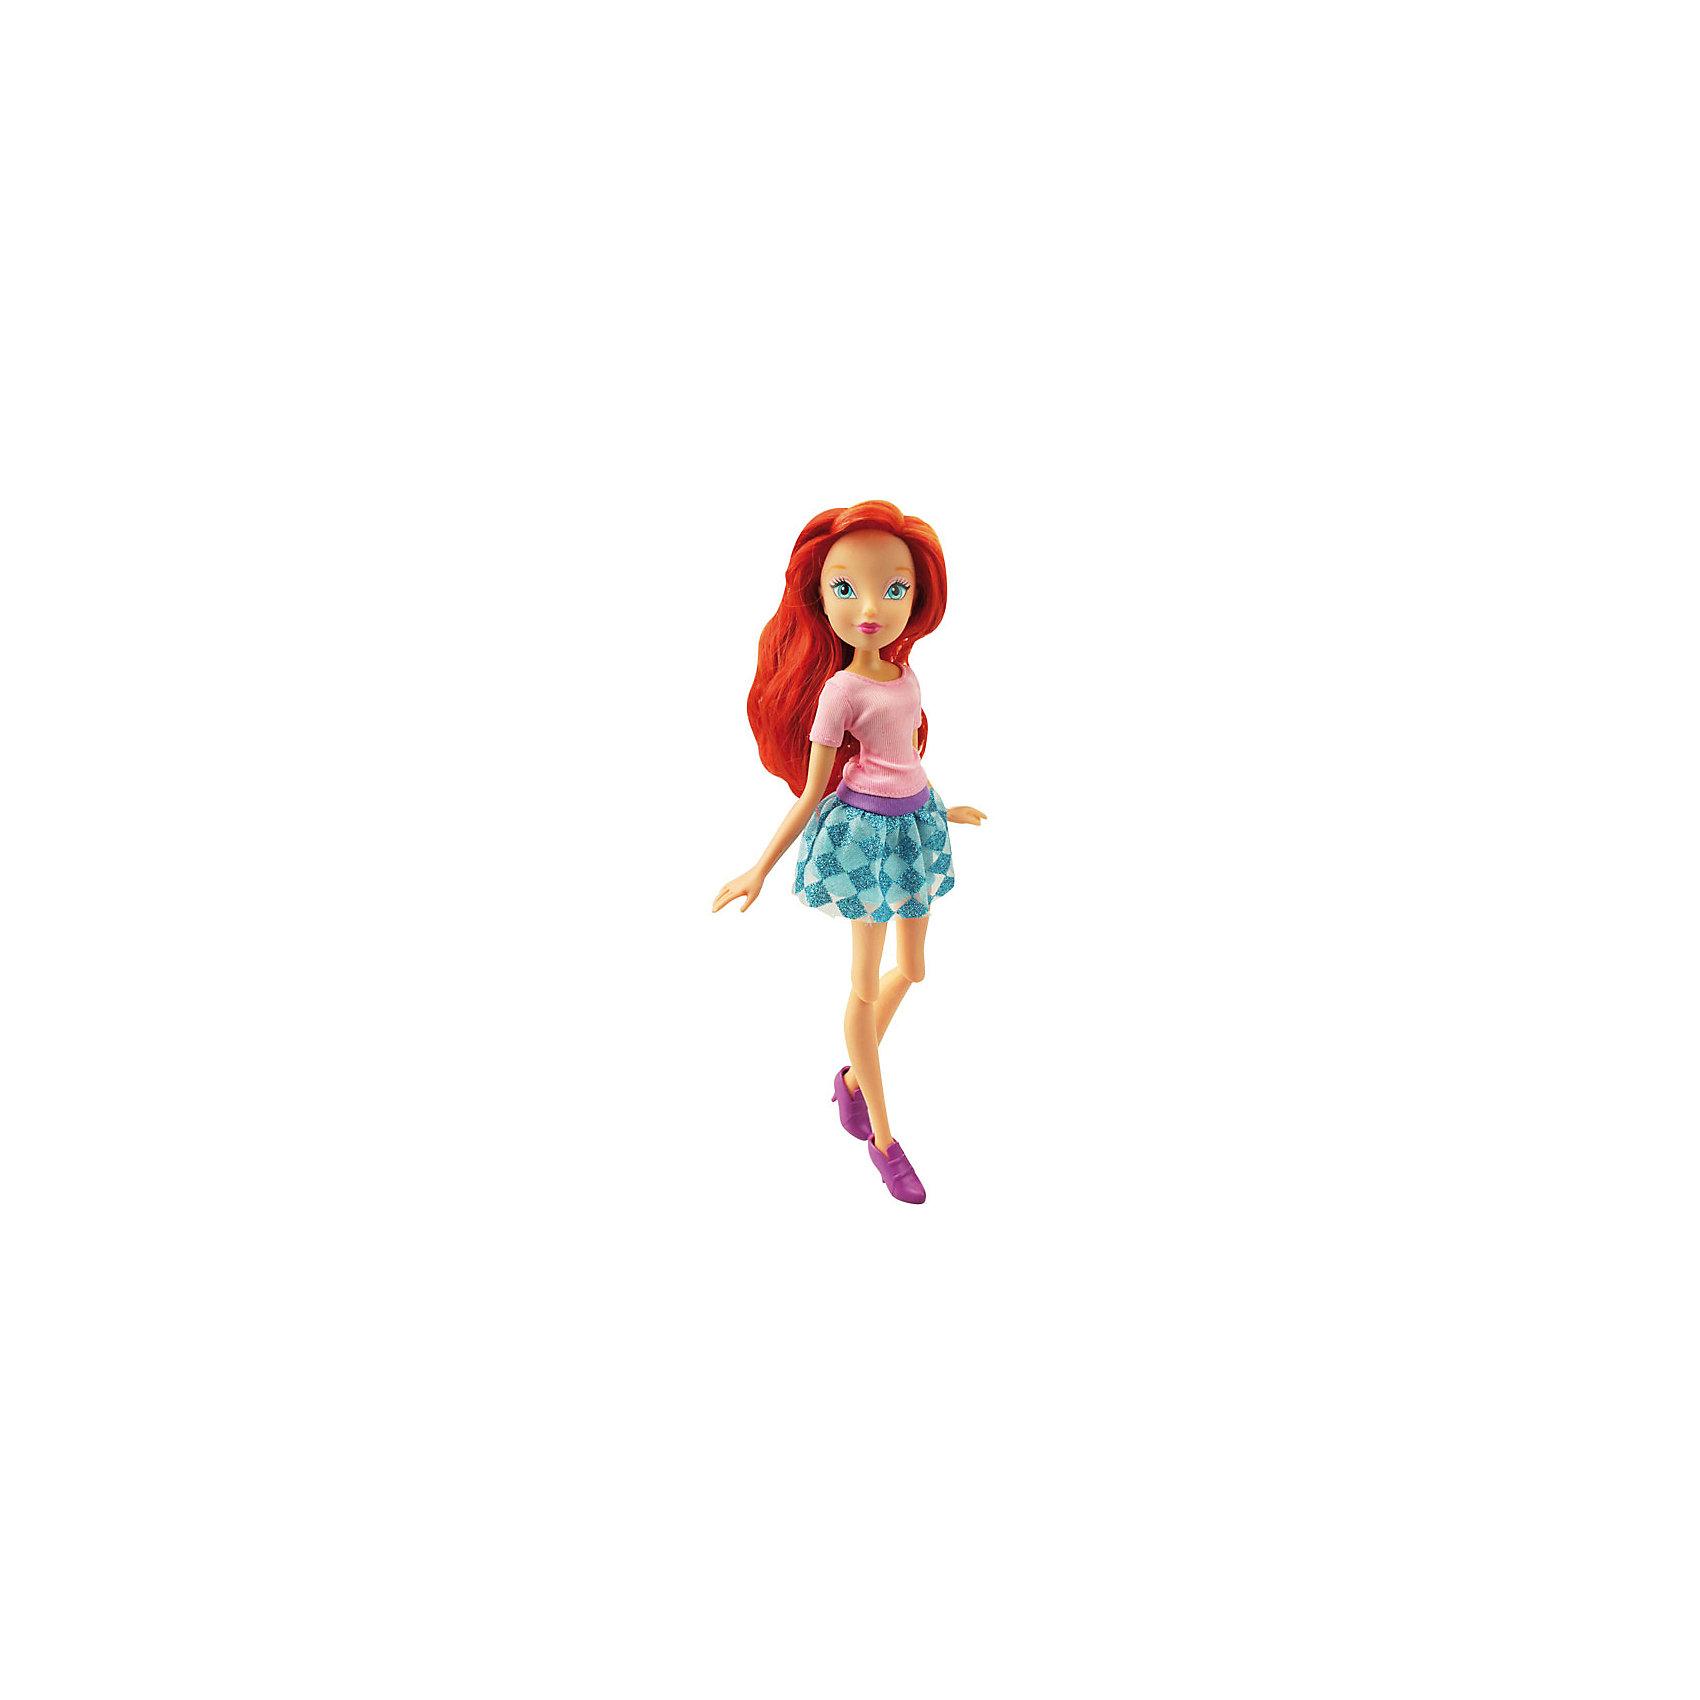 Кукла Городская магия - Блум, Winx Club<br><br>Ширина мм: 190<br>Глубина мм: 320<br>Высота мм: 60<br>Вес г: 256<br>Возраст от месяцев: 36<br>Возраст до месяцев: 120<br>Пол: Женский<br>Возраст: Детский<br>SKU: 5383944